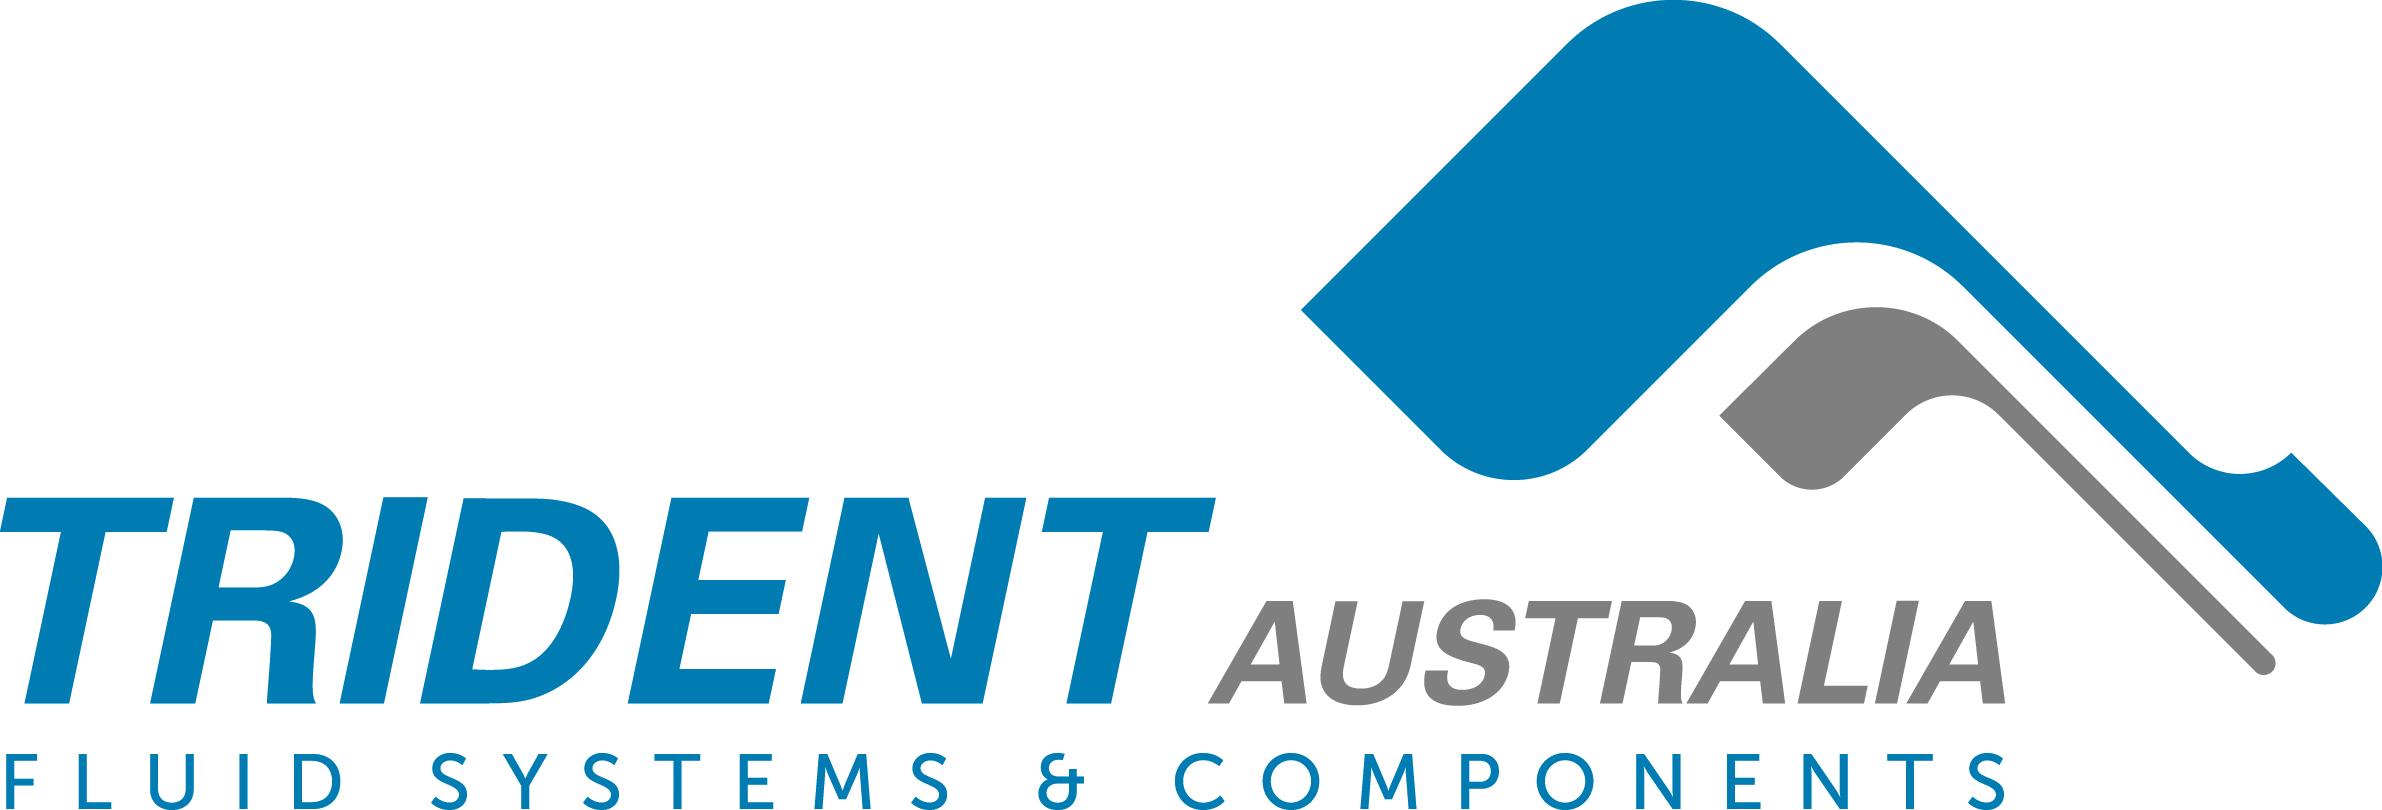 Trident Australia Pty Ltd